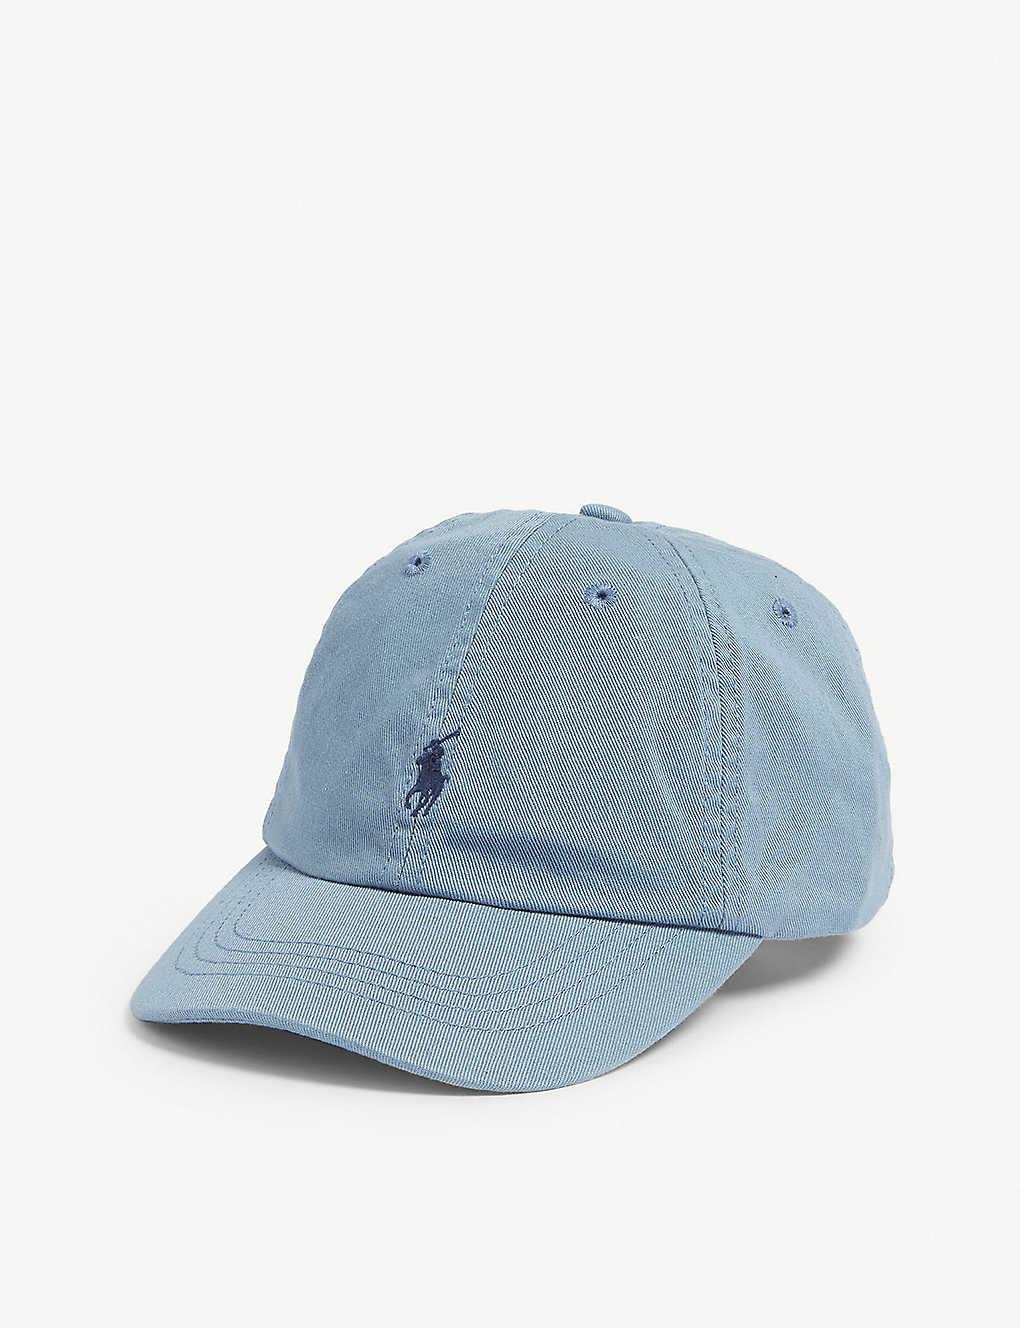 3170f1b1 RALPH LAUREN - Embroidered-logo cotton chino baseball cap ...